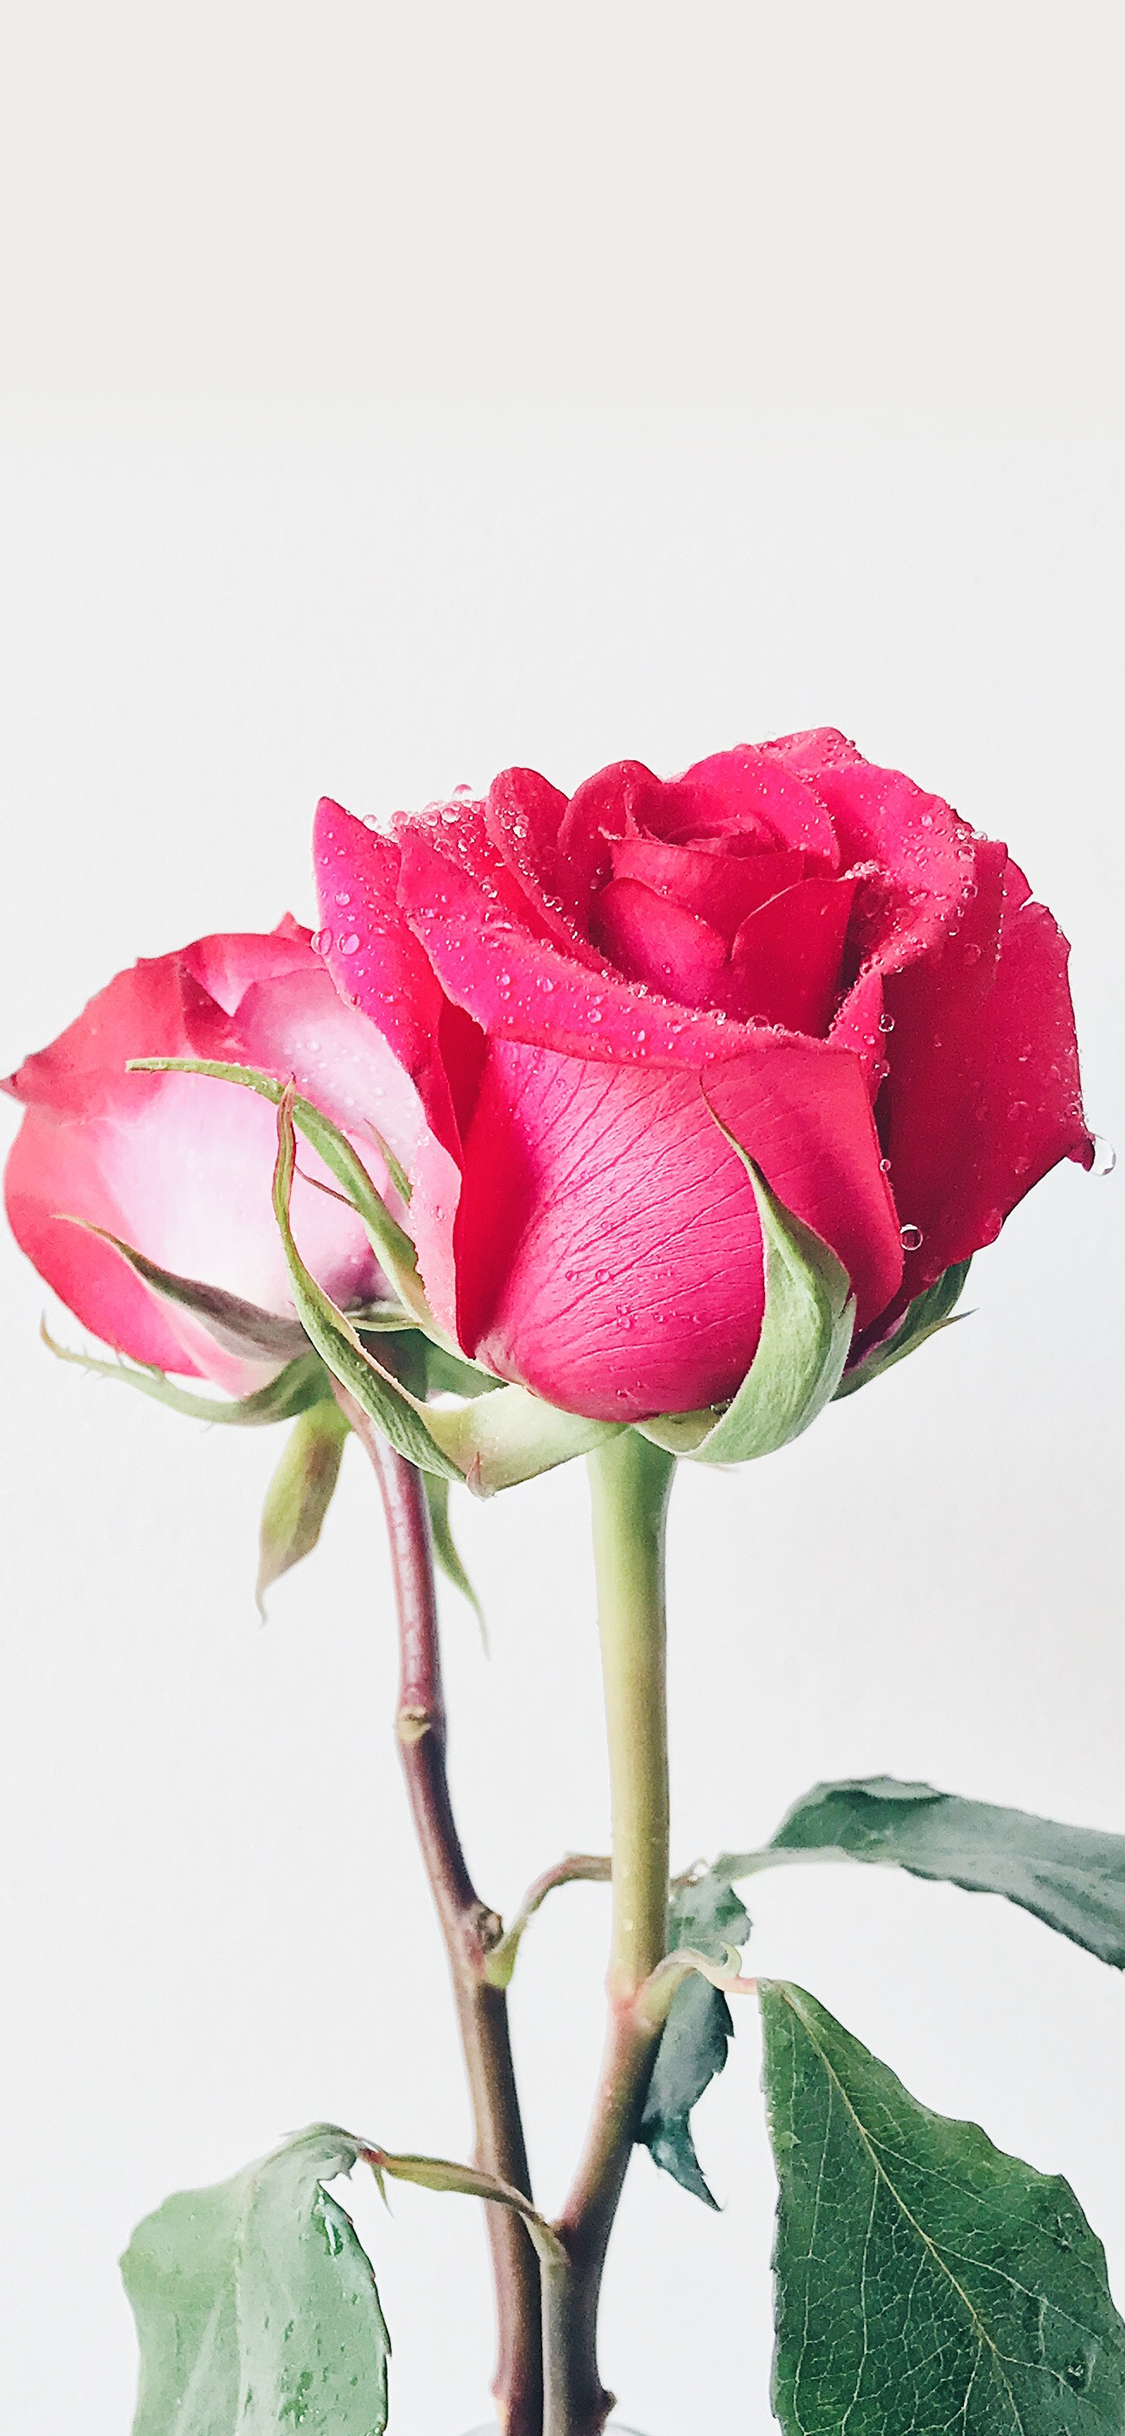 49 Beautiful Rose Iphone Wallpaper Hd Quality